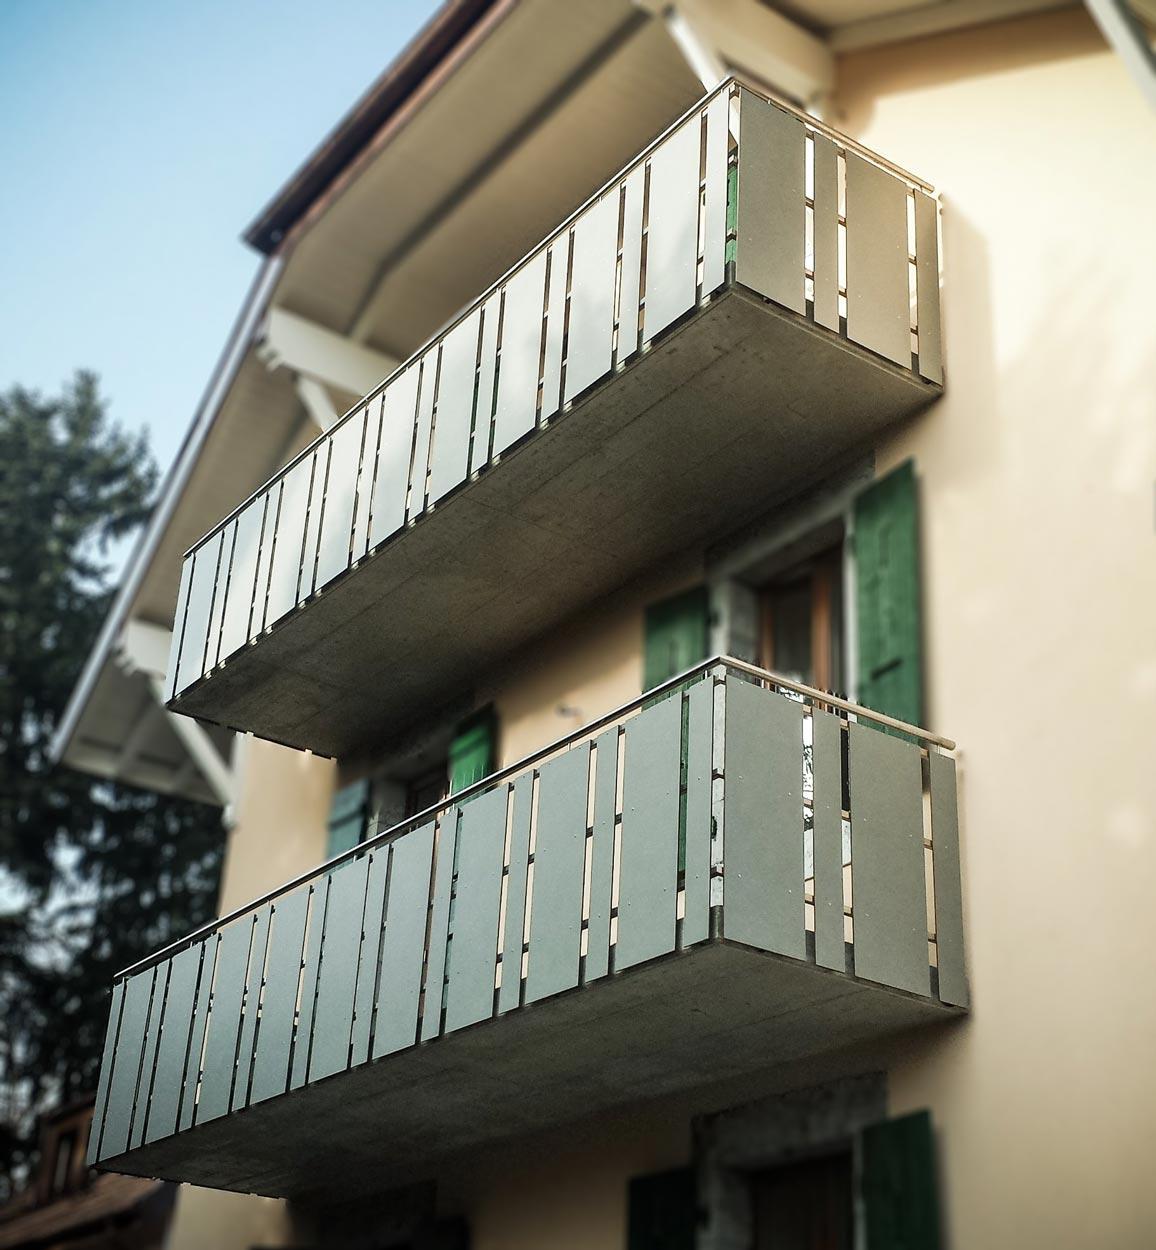 Garde-corps de balcon en inox et composites